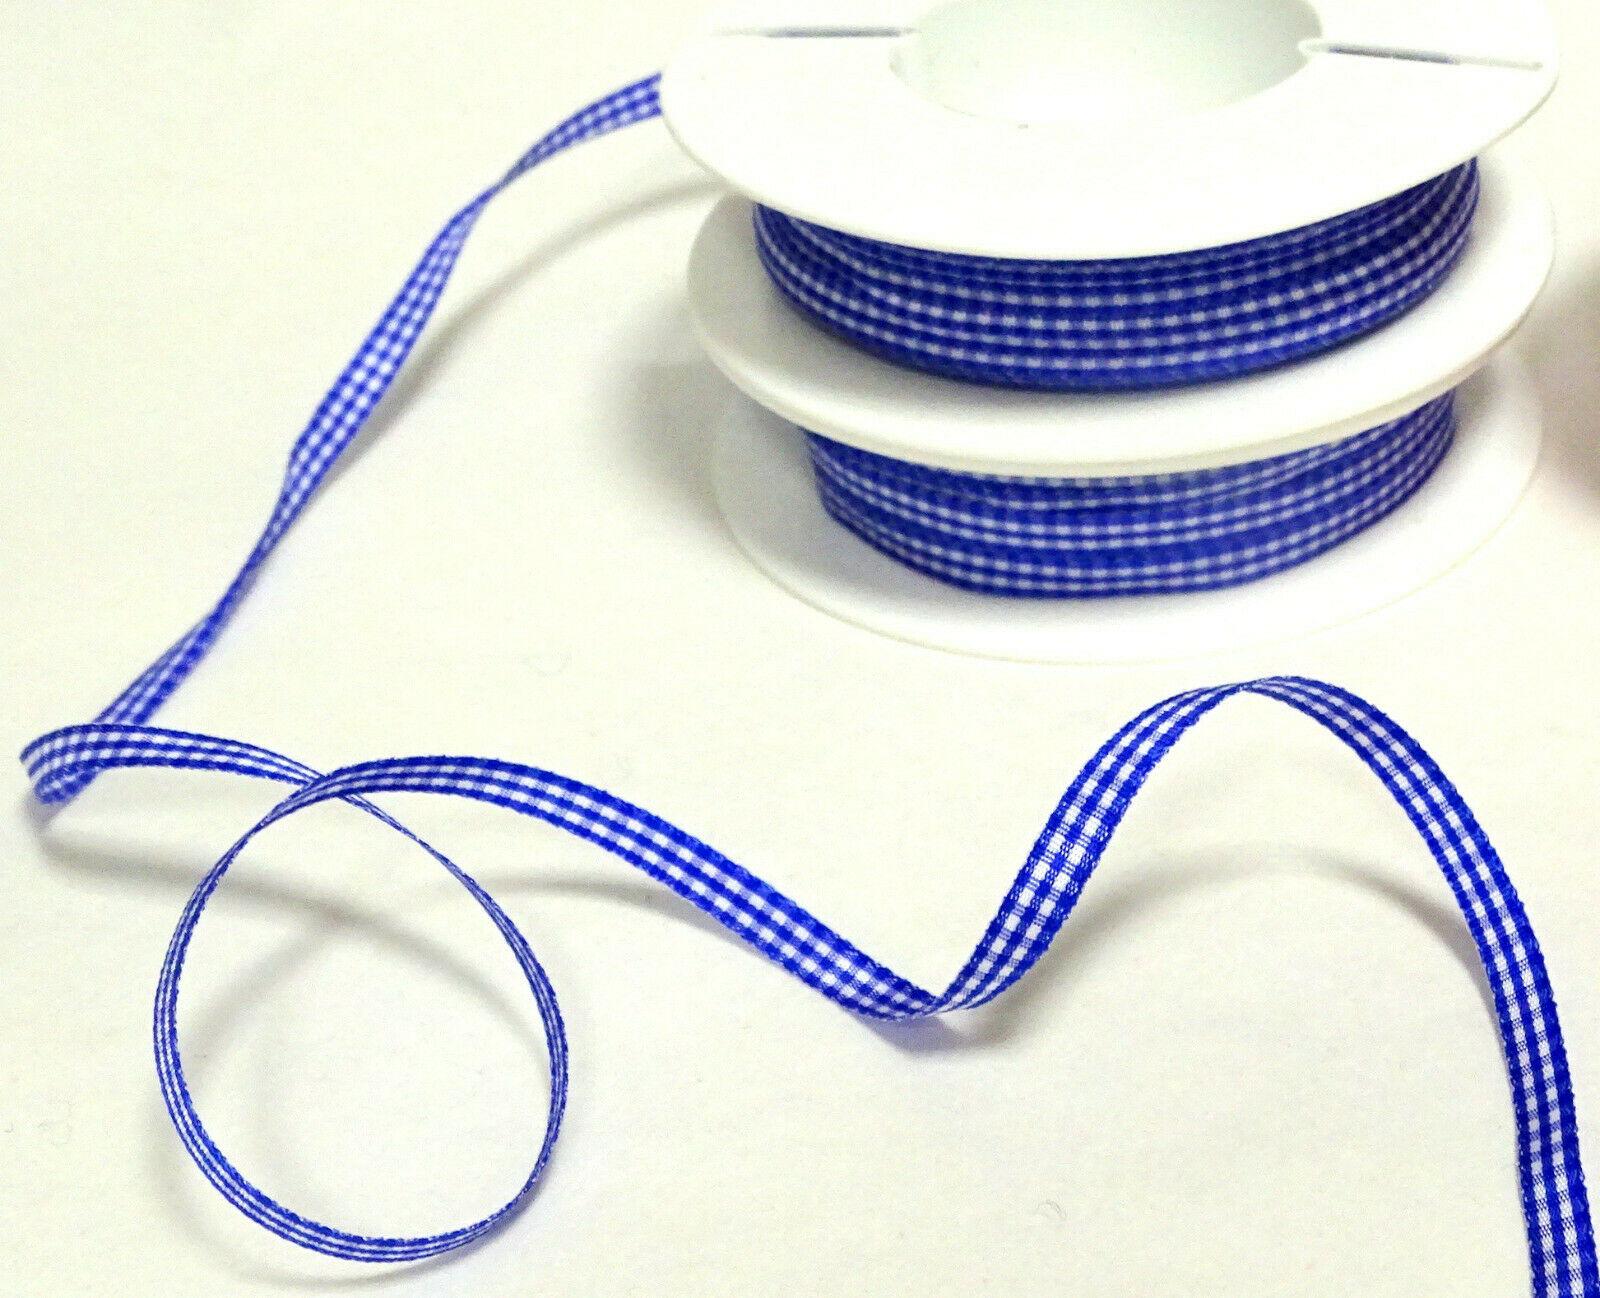 Karoband Schleifenband 50 m x 6mm / 10mm Vichy Dekoband ab 0,18€/m Blau kariert - 6 mm x 50 m